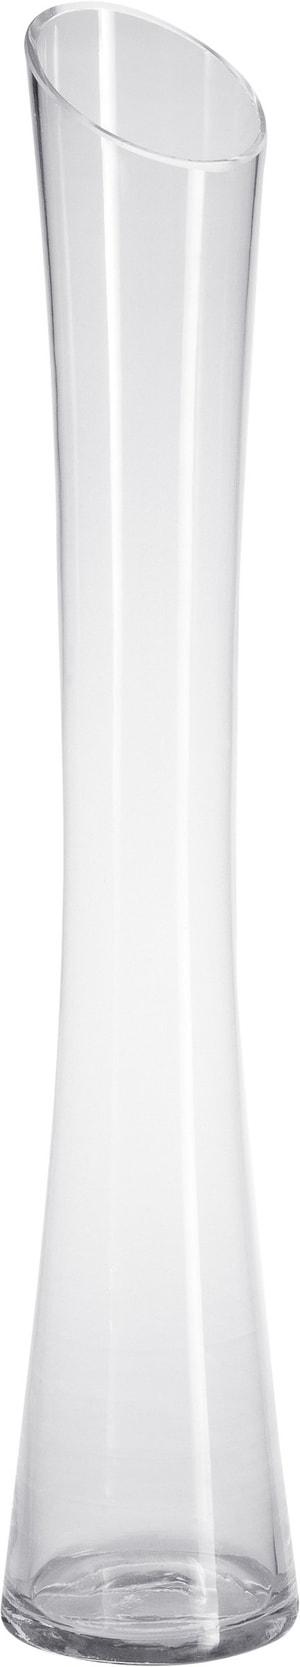 Vase Flute